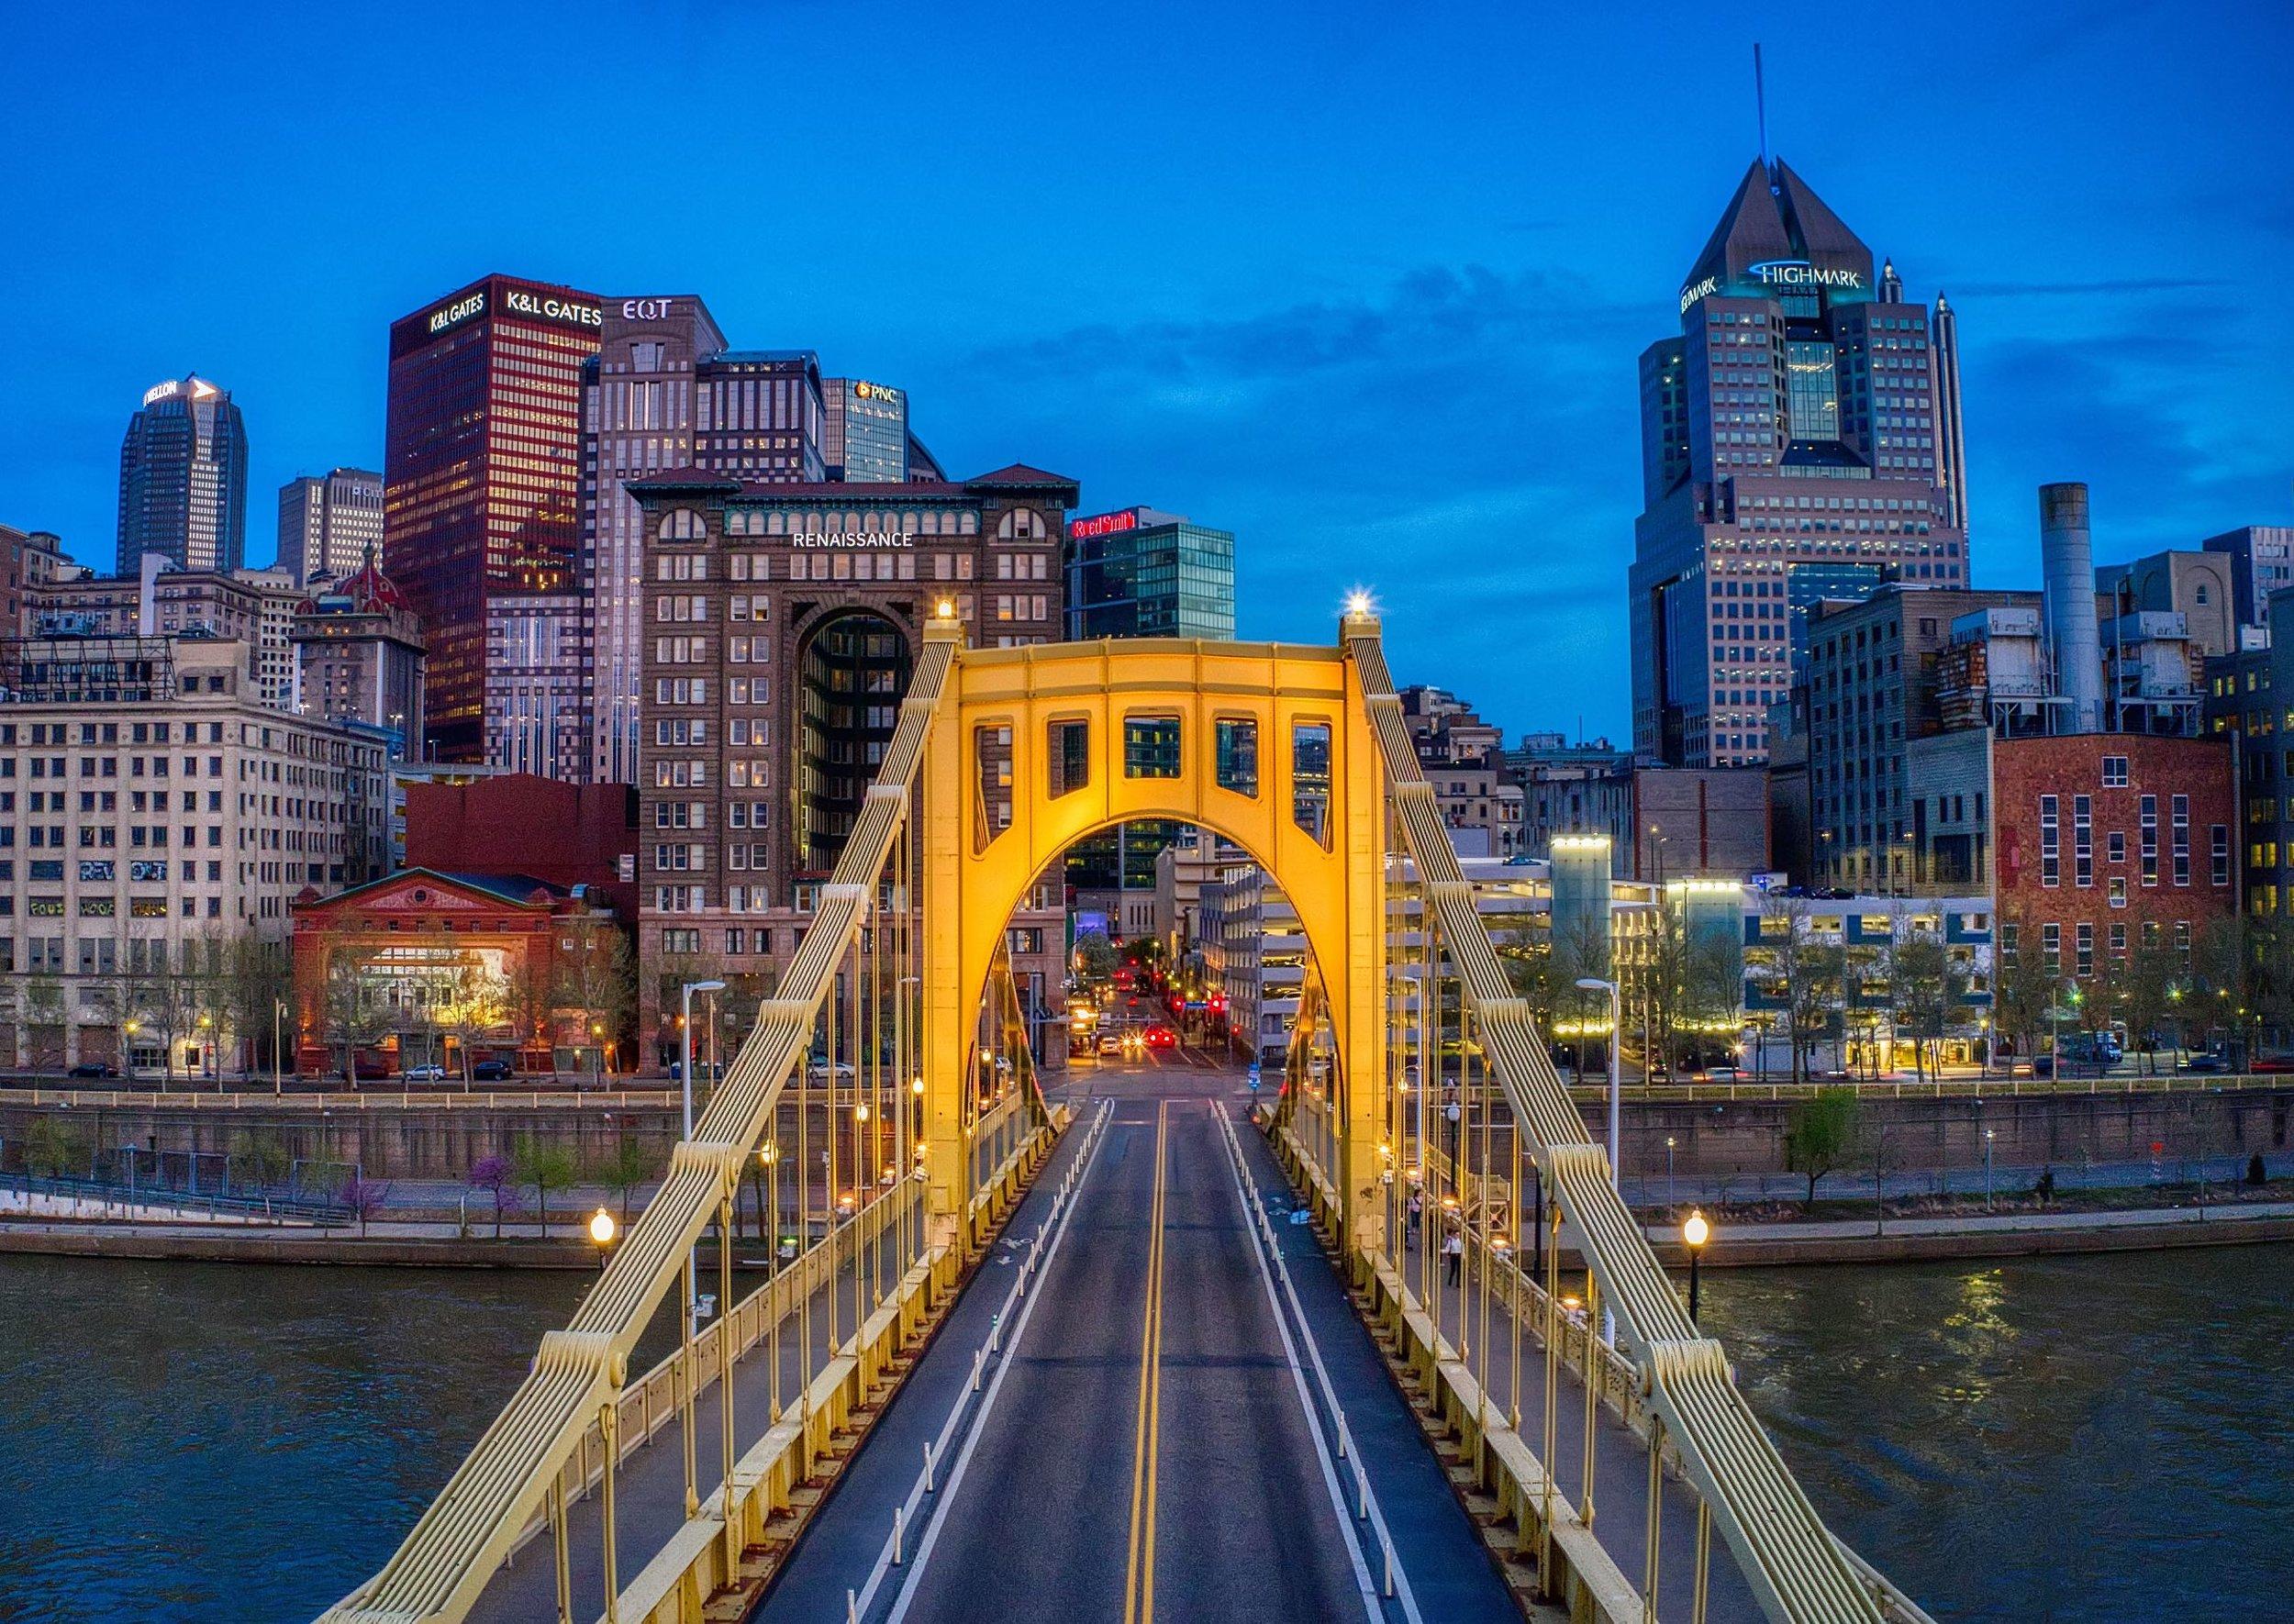 6th Street - Pittsburgh